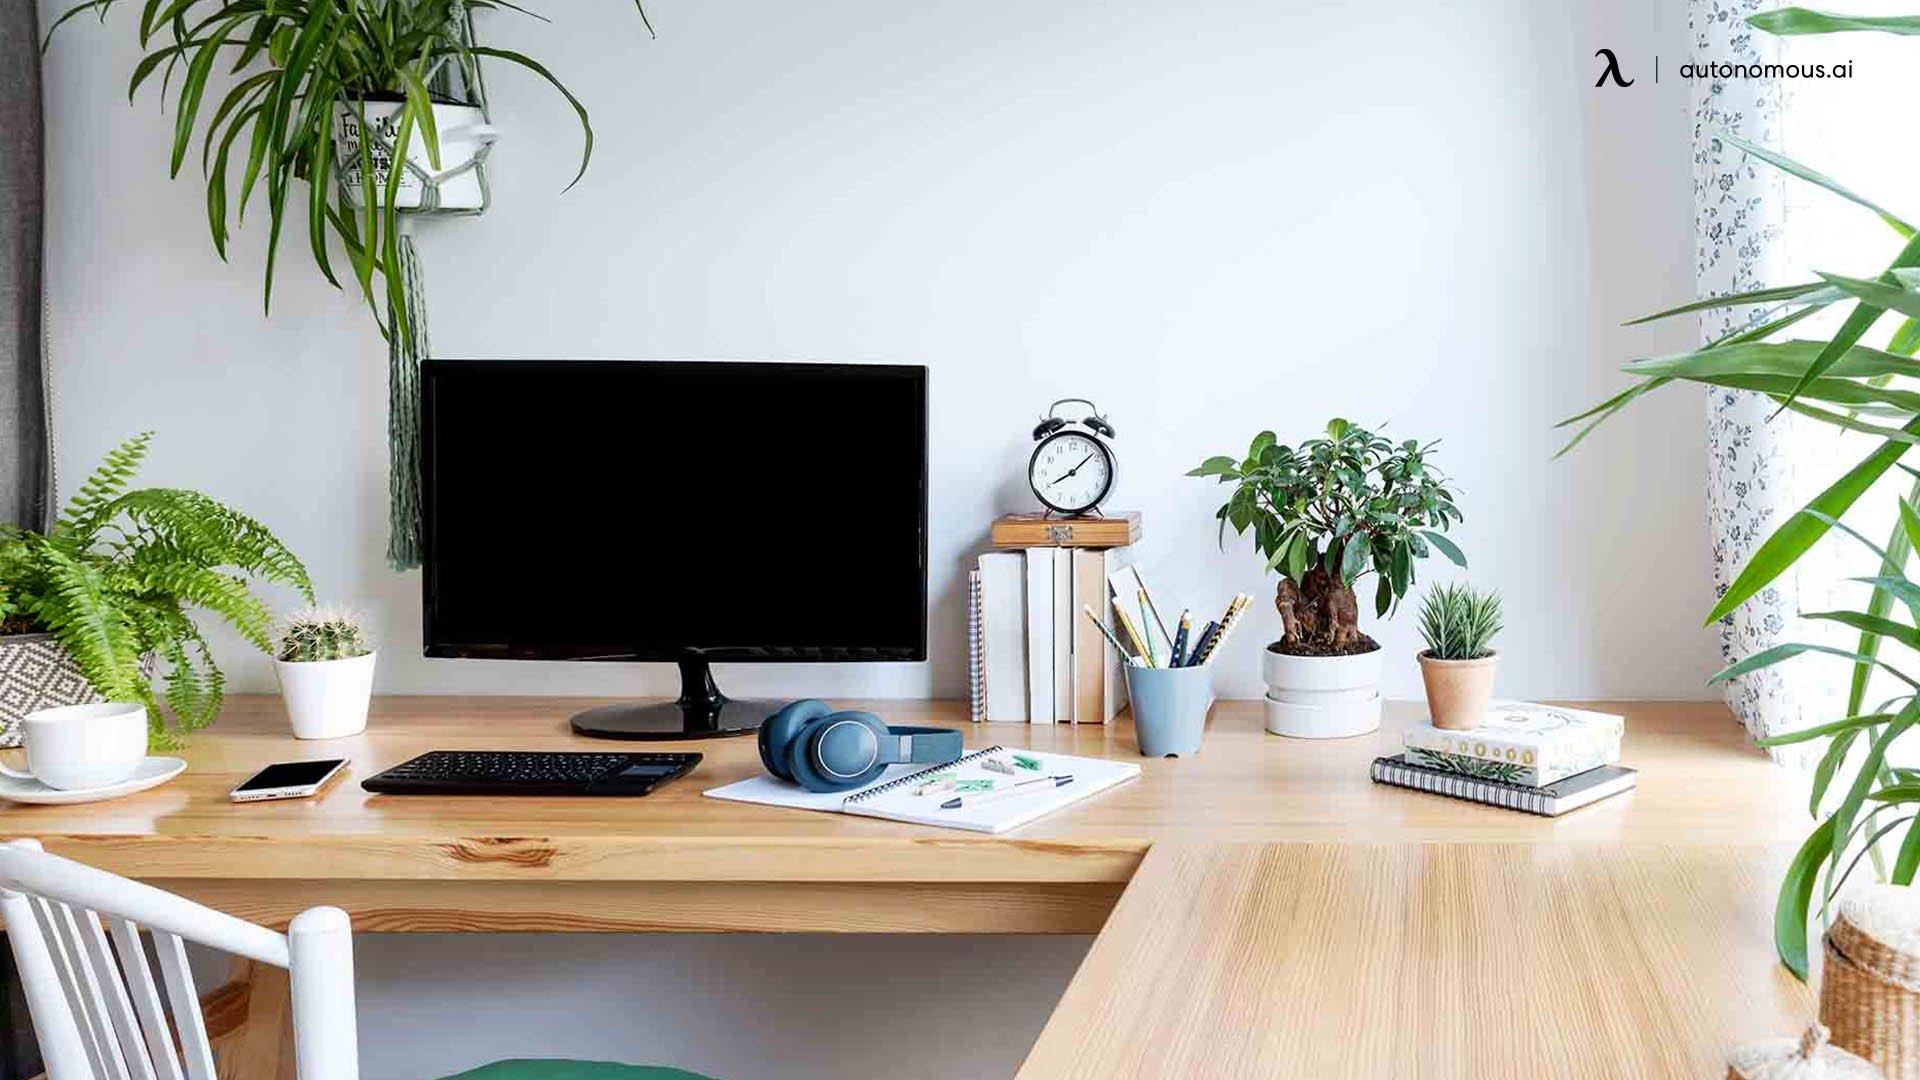 Personalized Wood Desk Setup